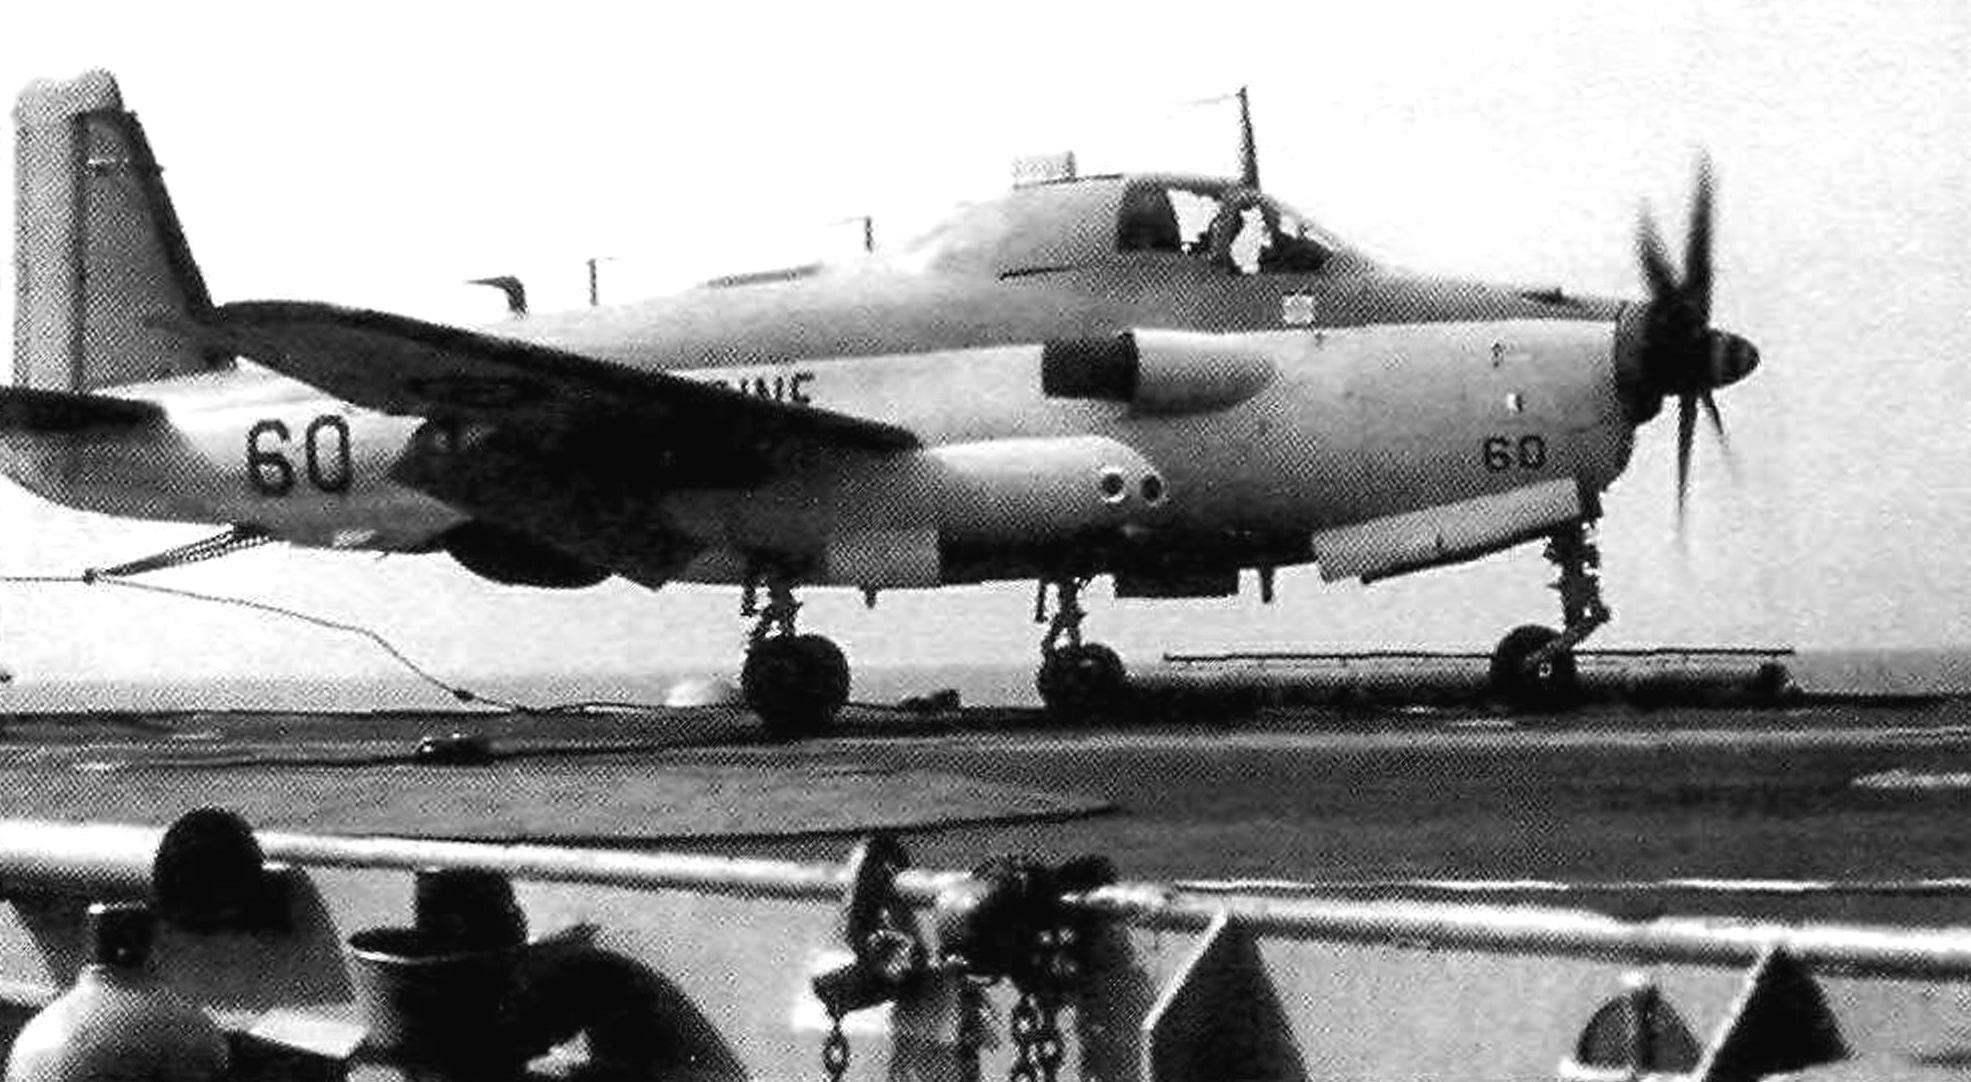 Палубный самолёт Breguet Br.1050 Alize